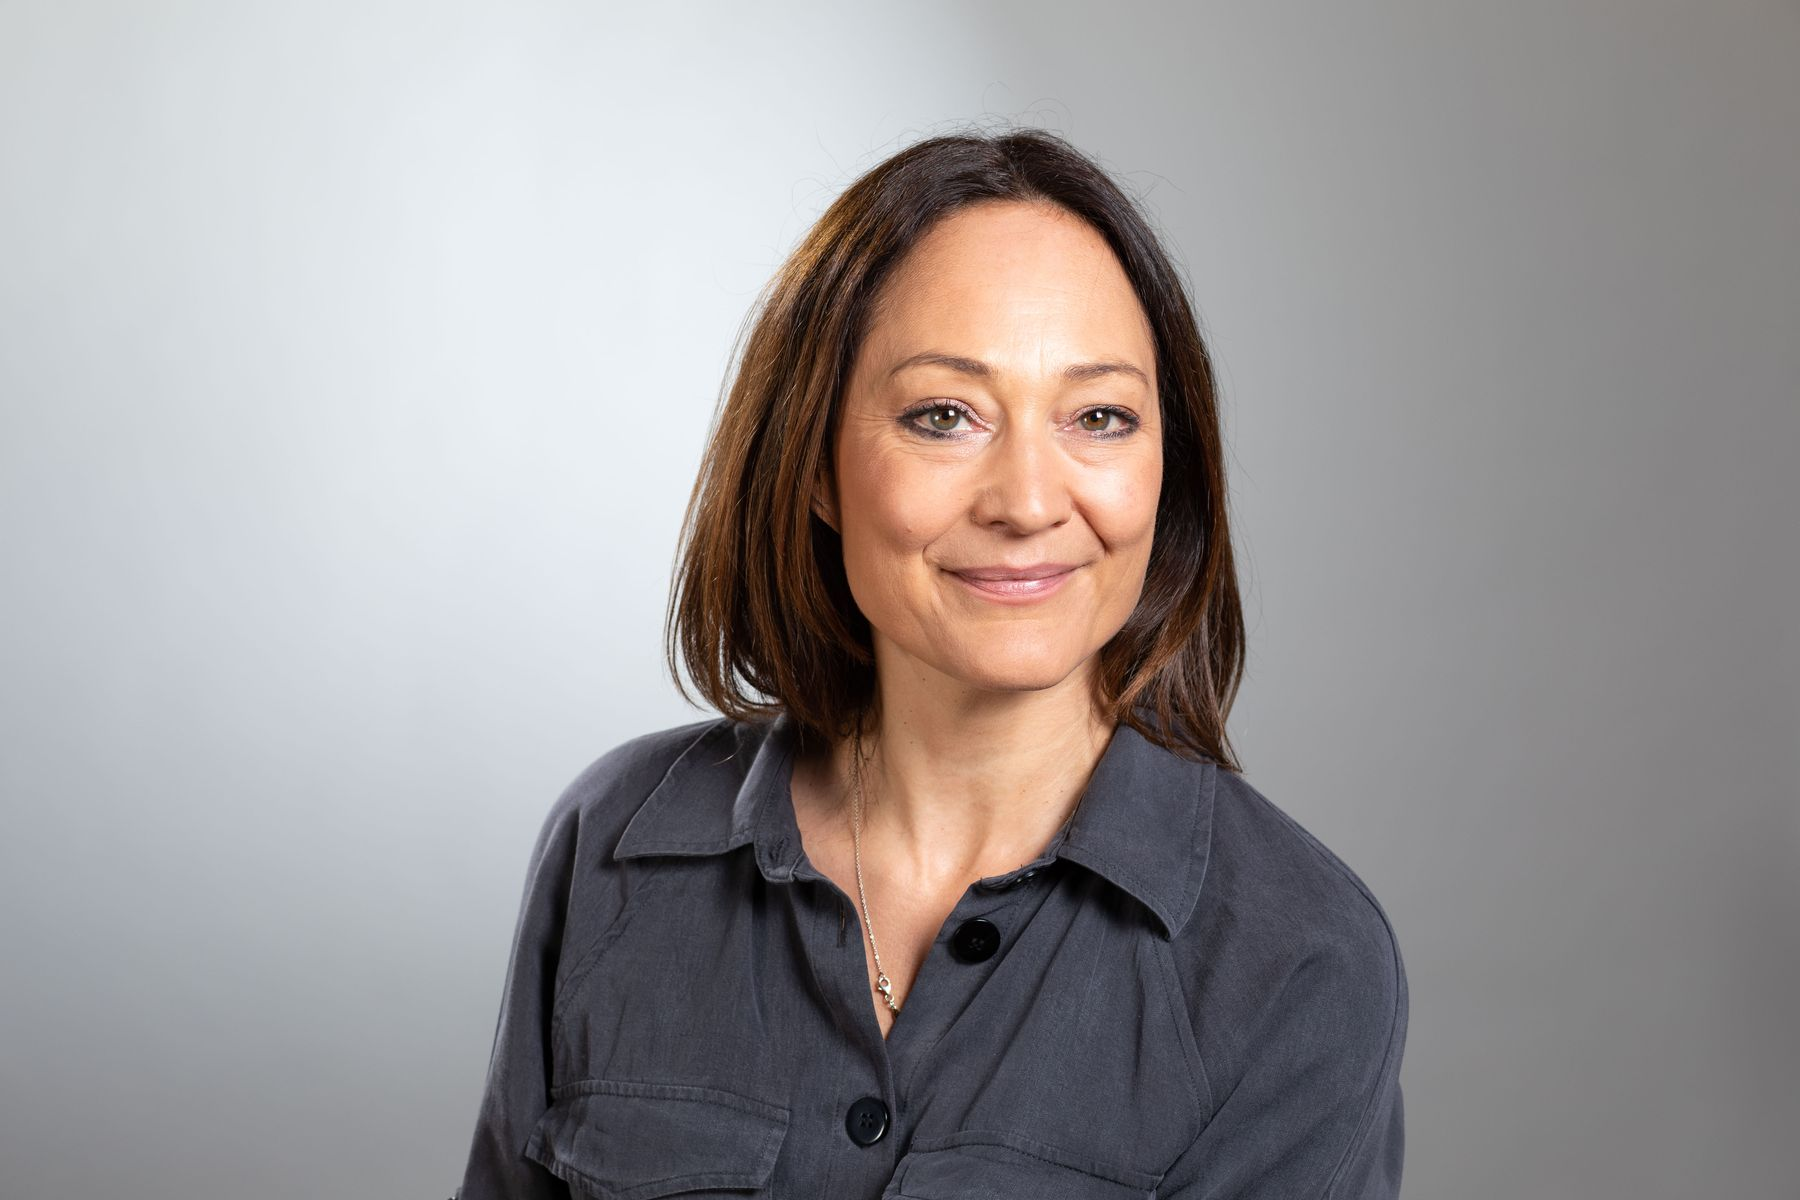 Hilary Campton, director at V Formation